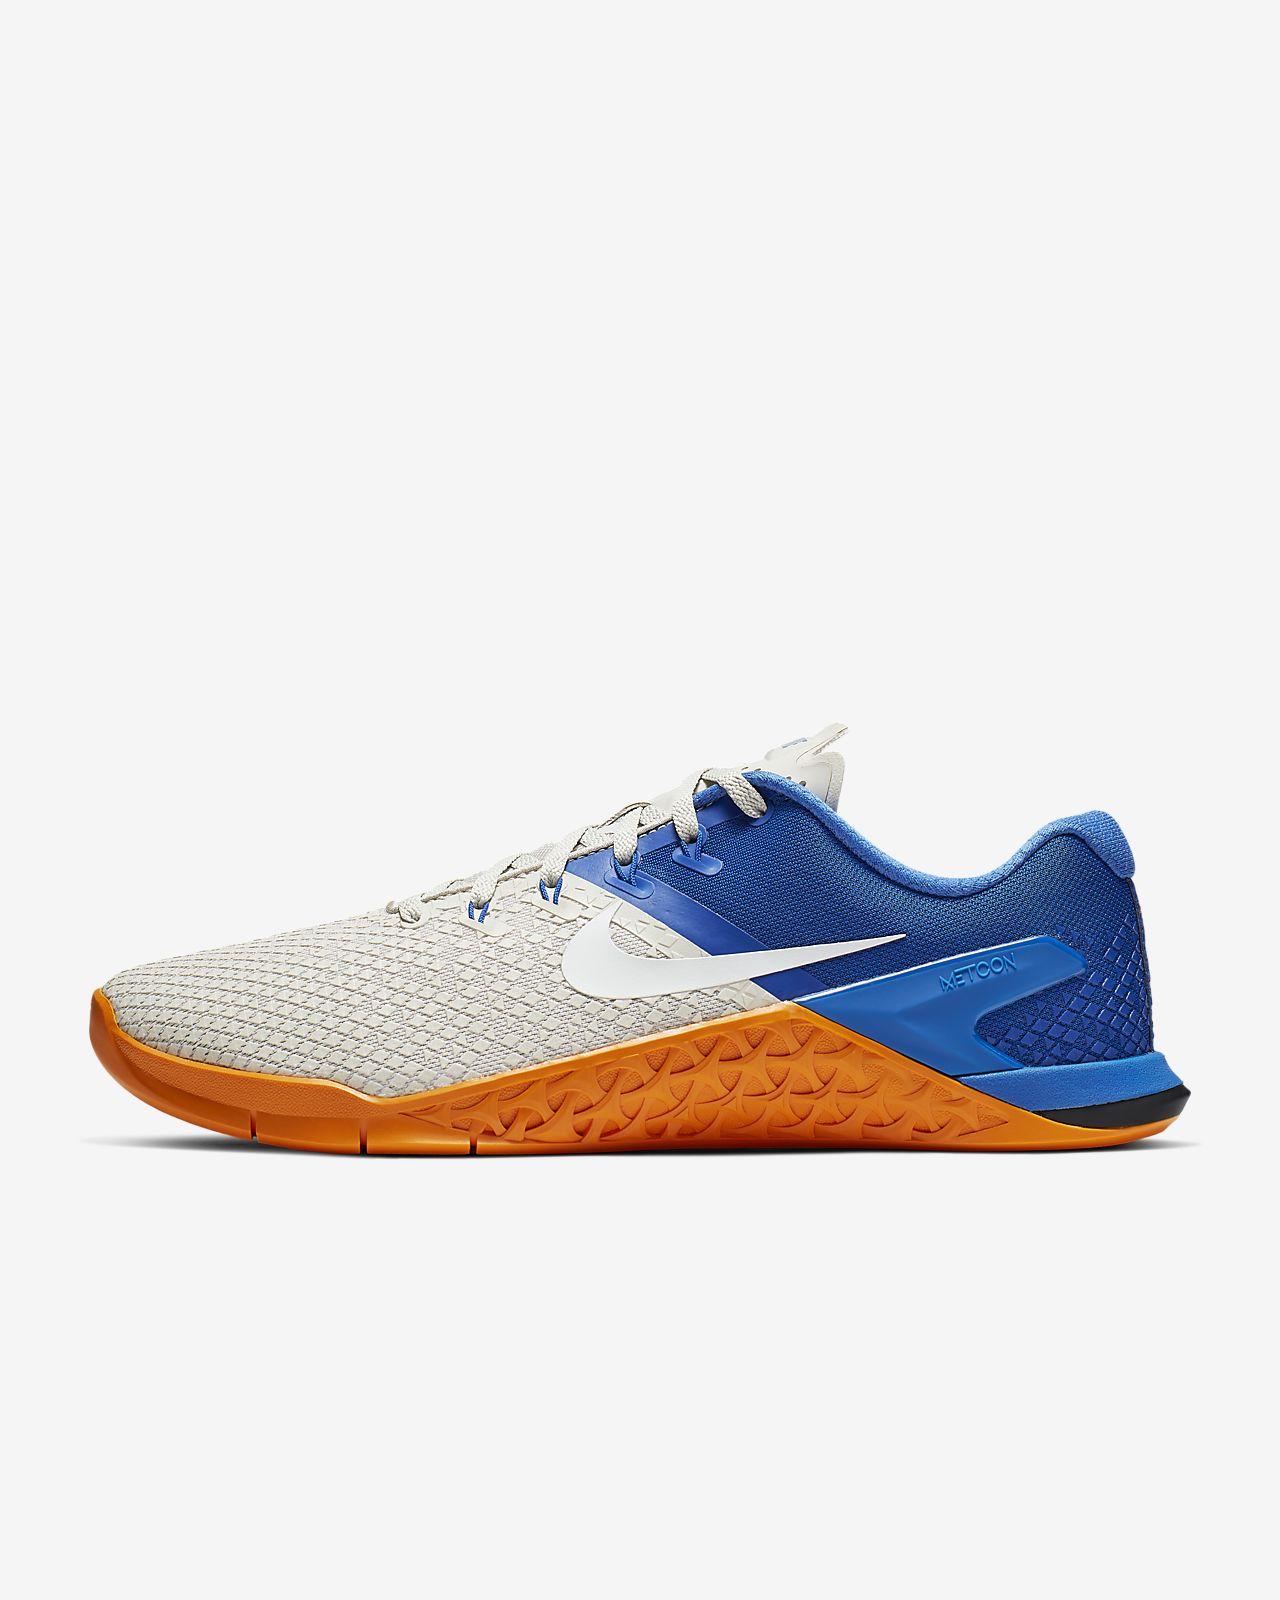 buy online dae43 323bf ... Scarpa da training Nike Metcon 4 XD - Uomo